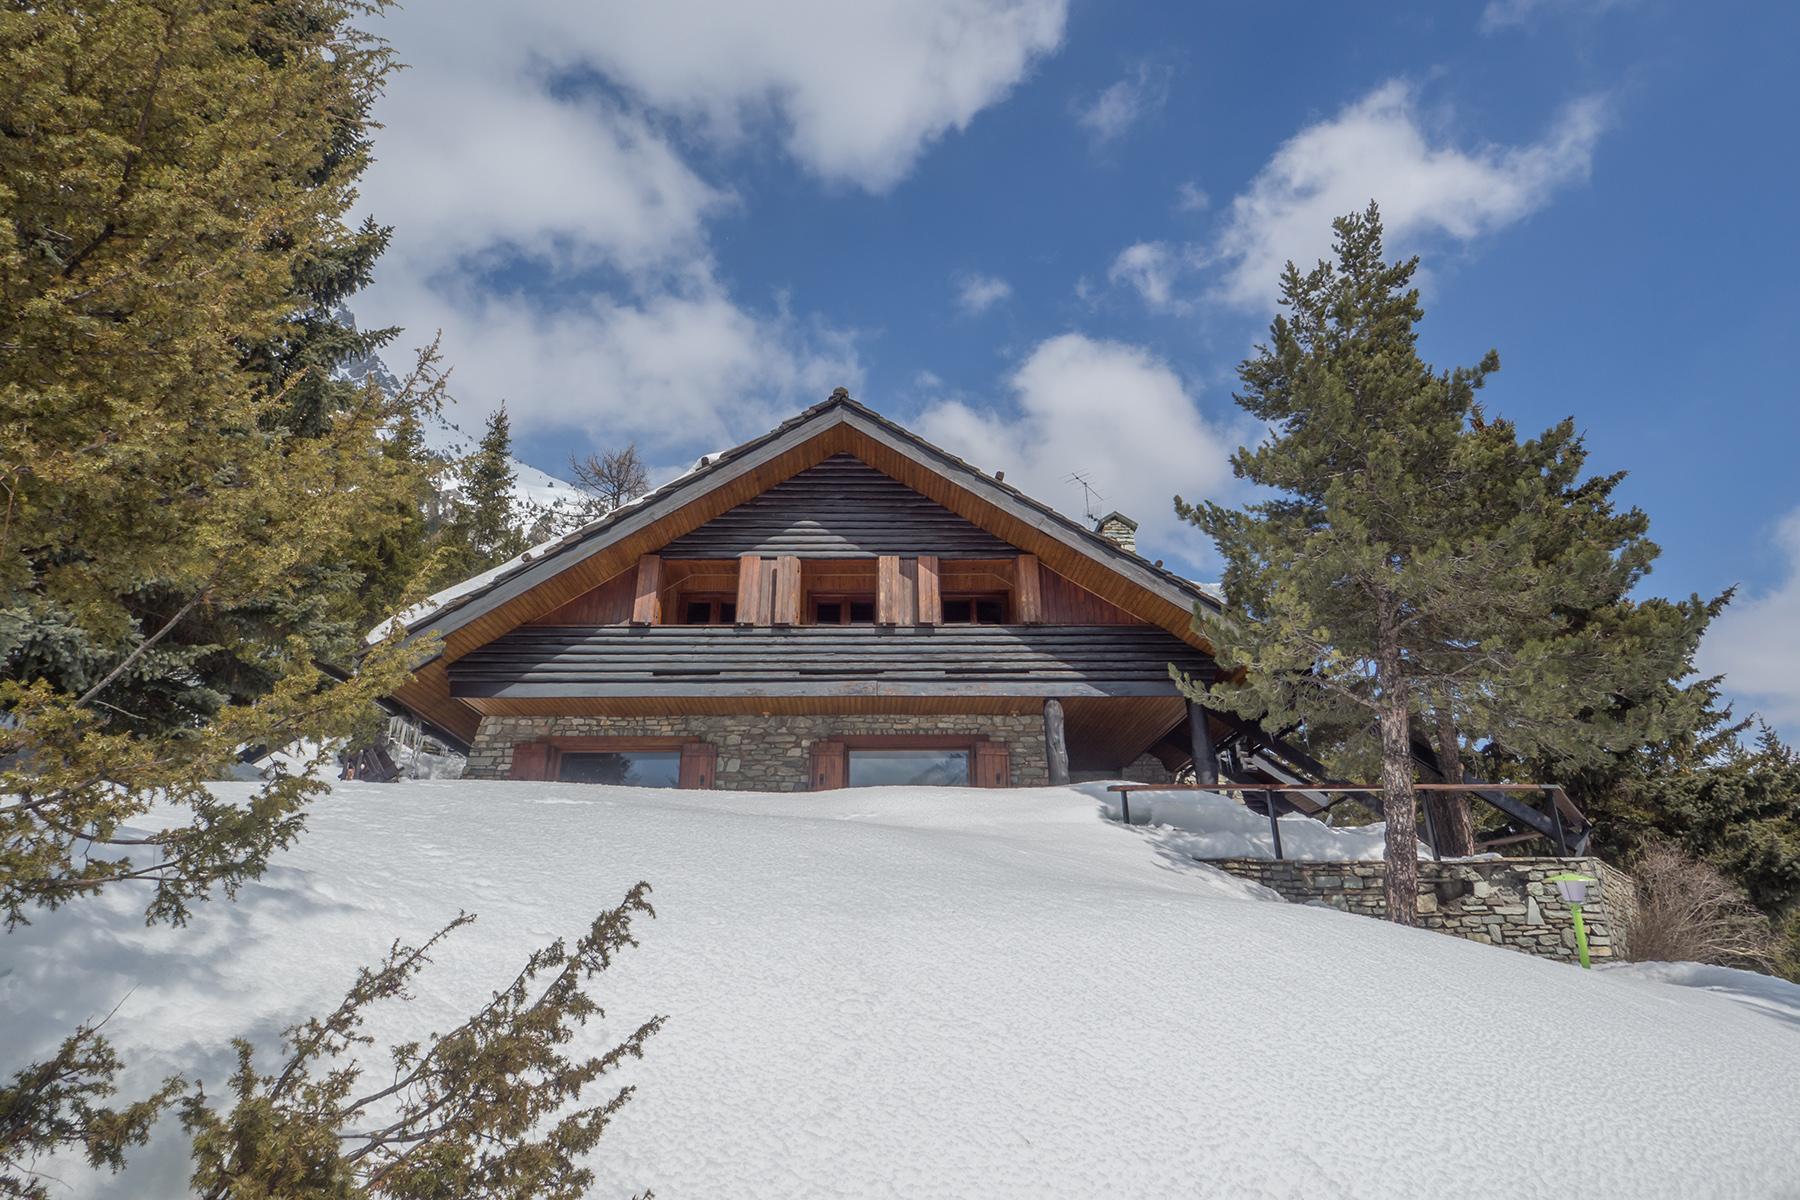 Casa indipendente in Vendita a Claviere: 5 locali, 420 mq